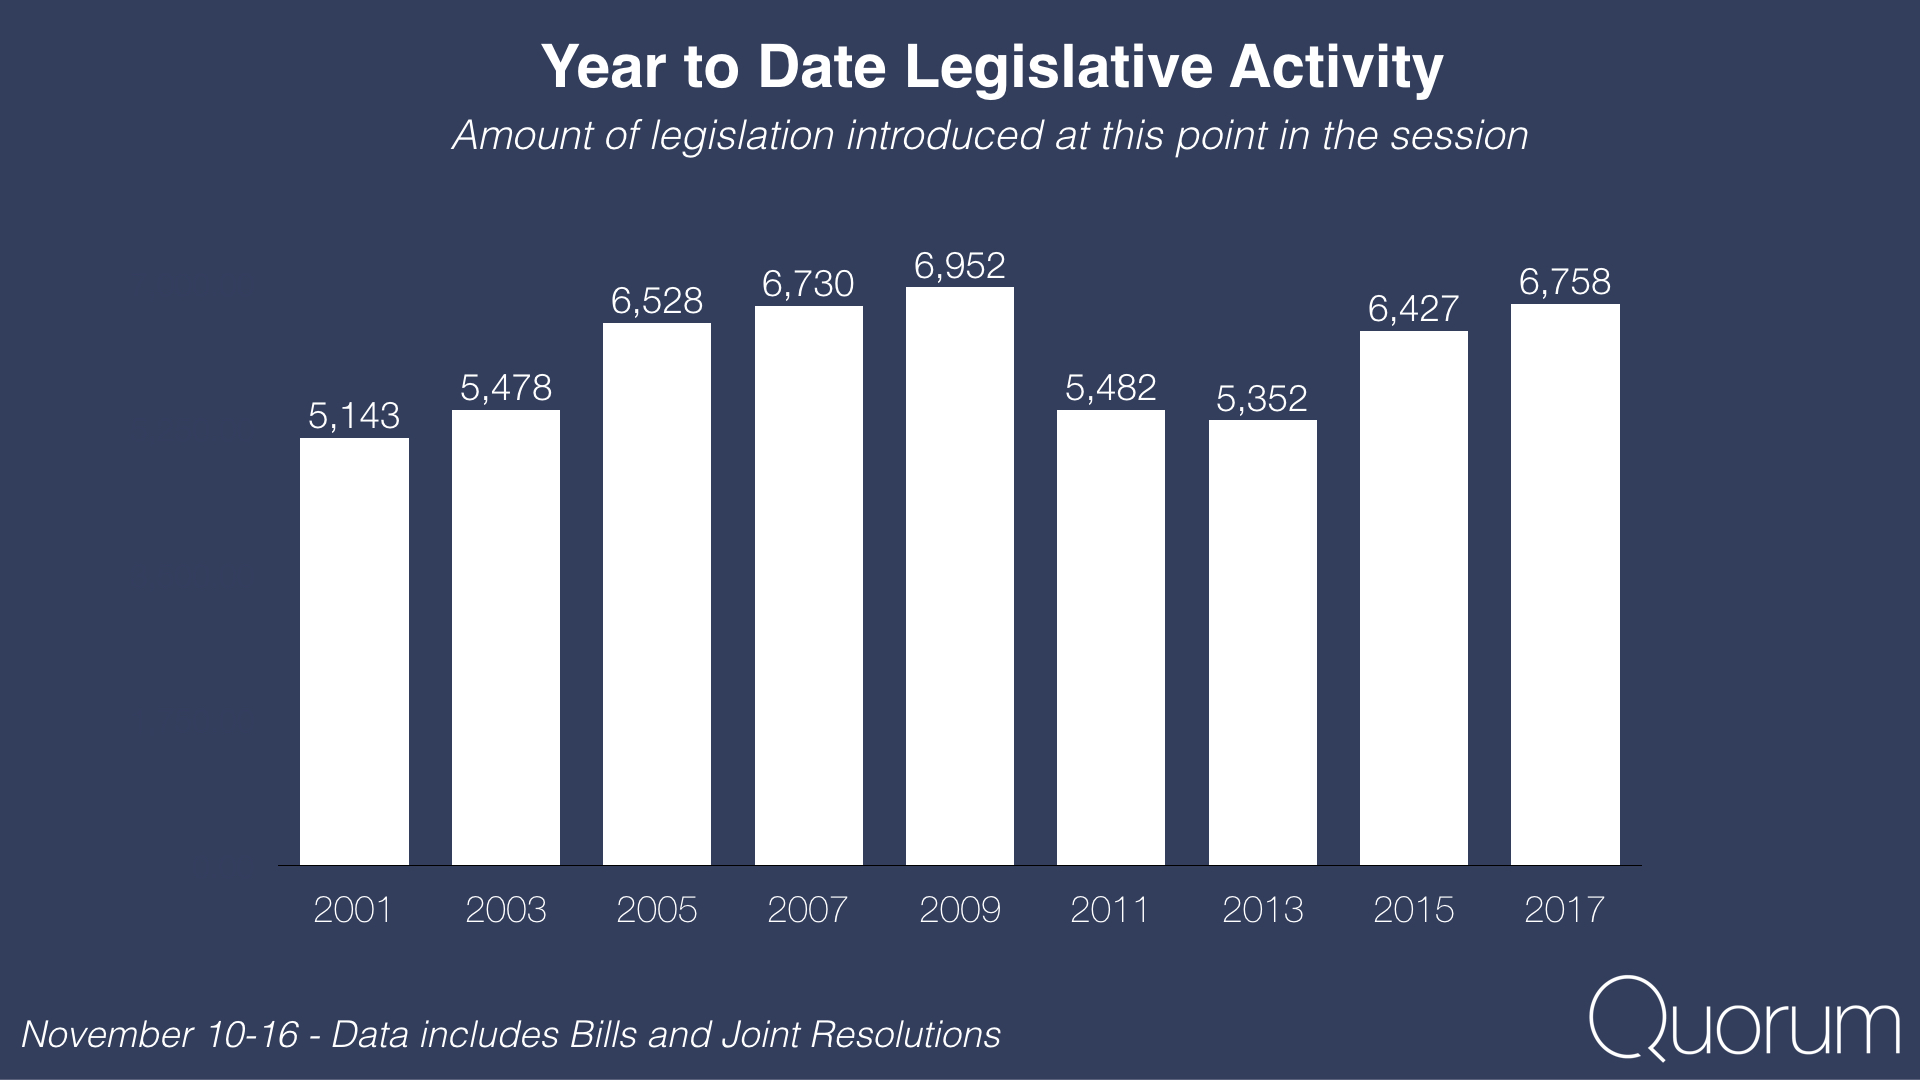 Year to date legislative activity.